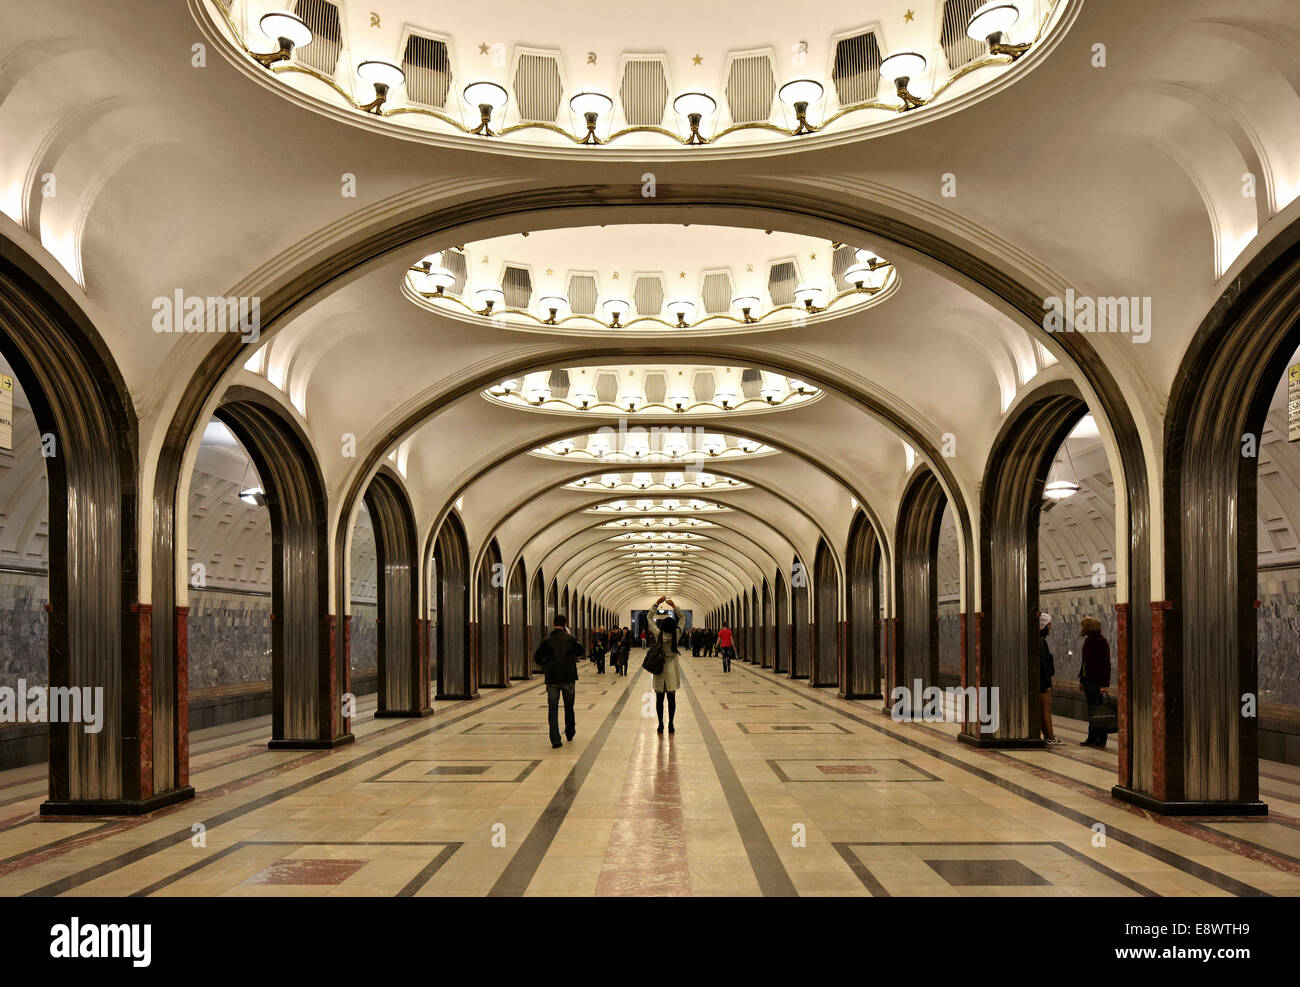 Decke Detail in Moskauer Metro, Moskau, Russland. Stockbild